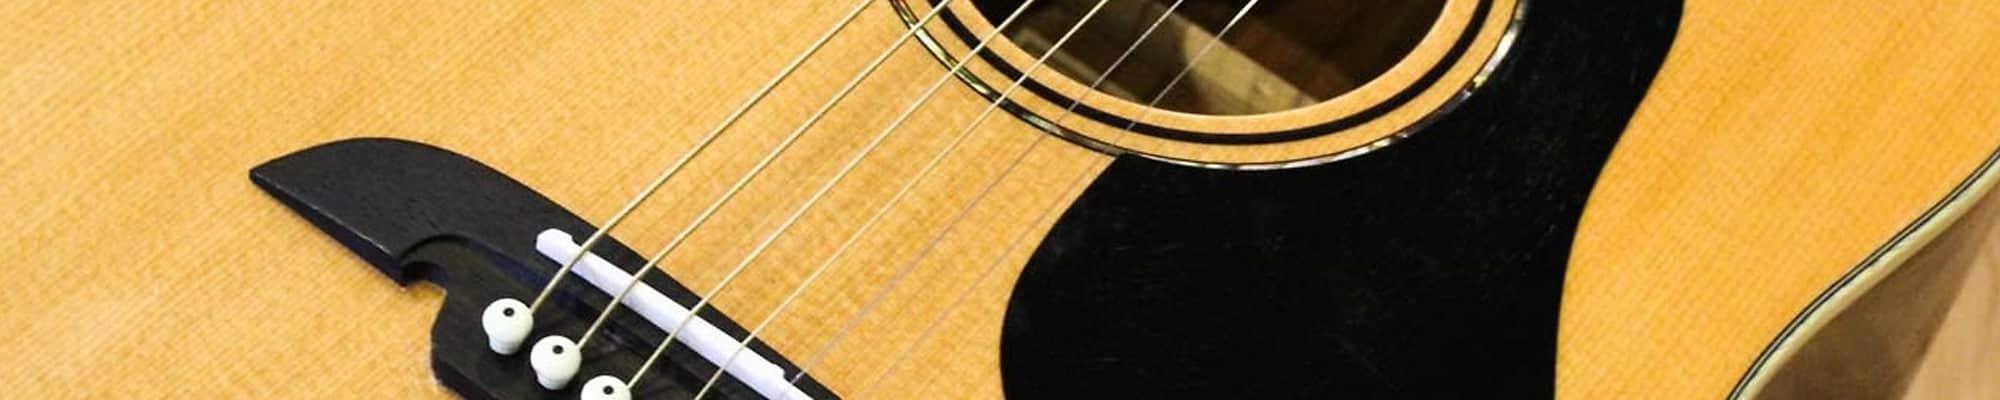 Alvarez Ad70Sc Acoustic Electric Guitar alvarez in acoustic-electric guitars | reverb